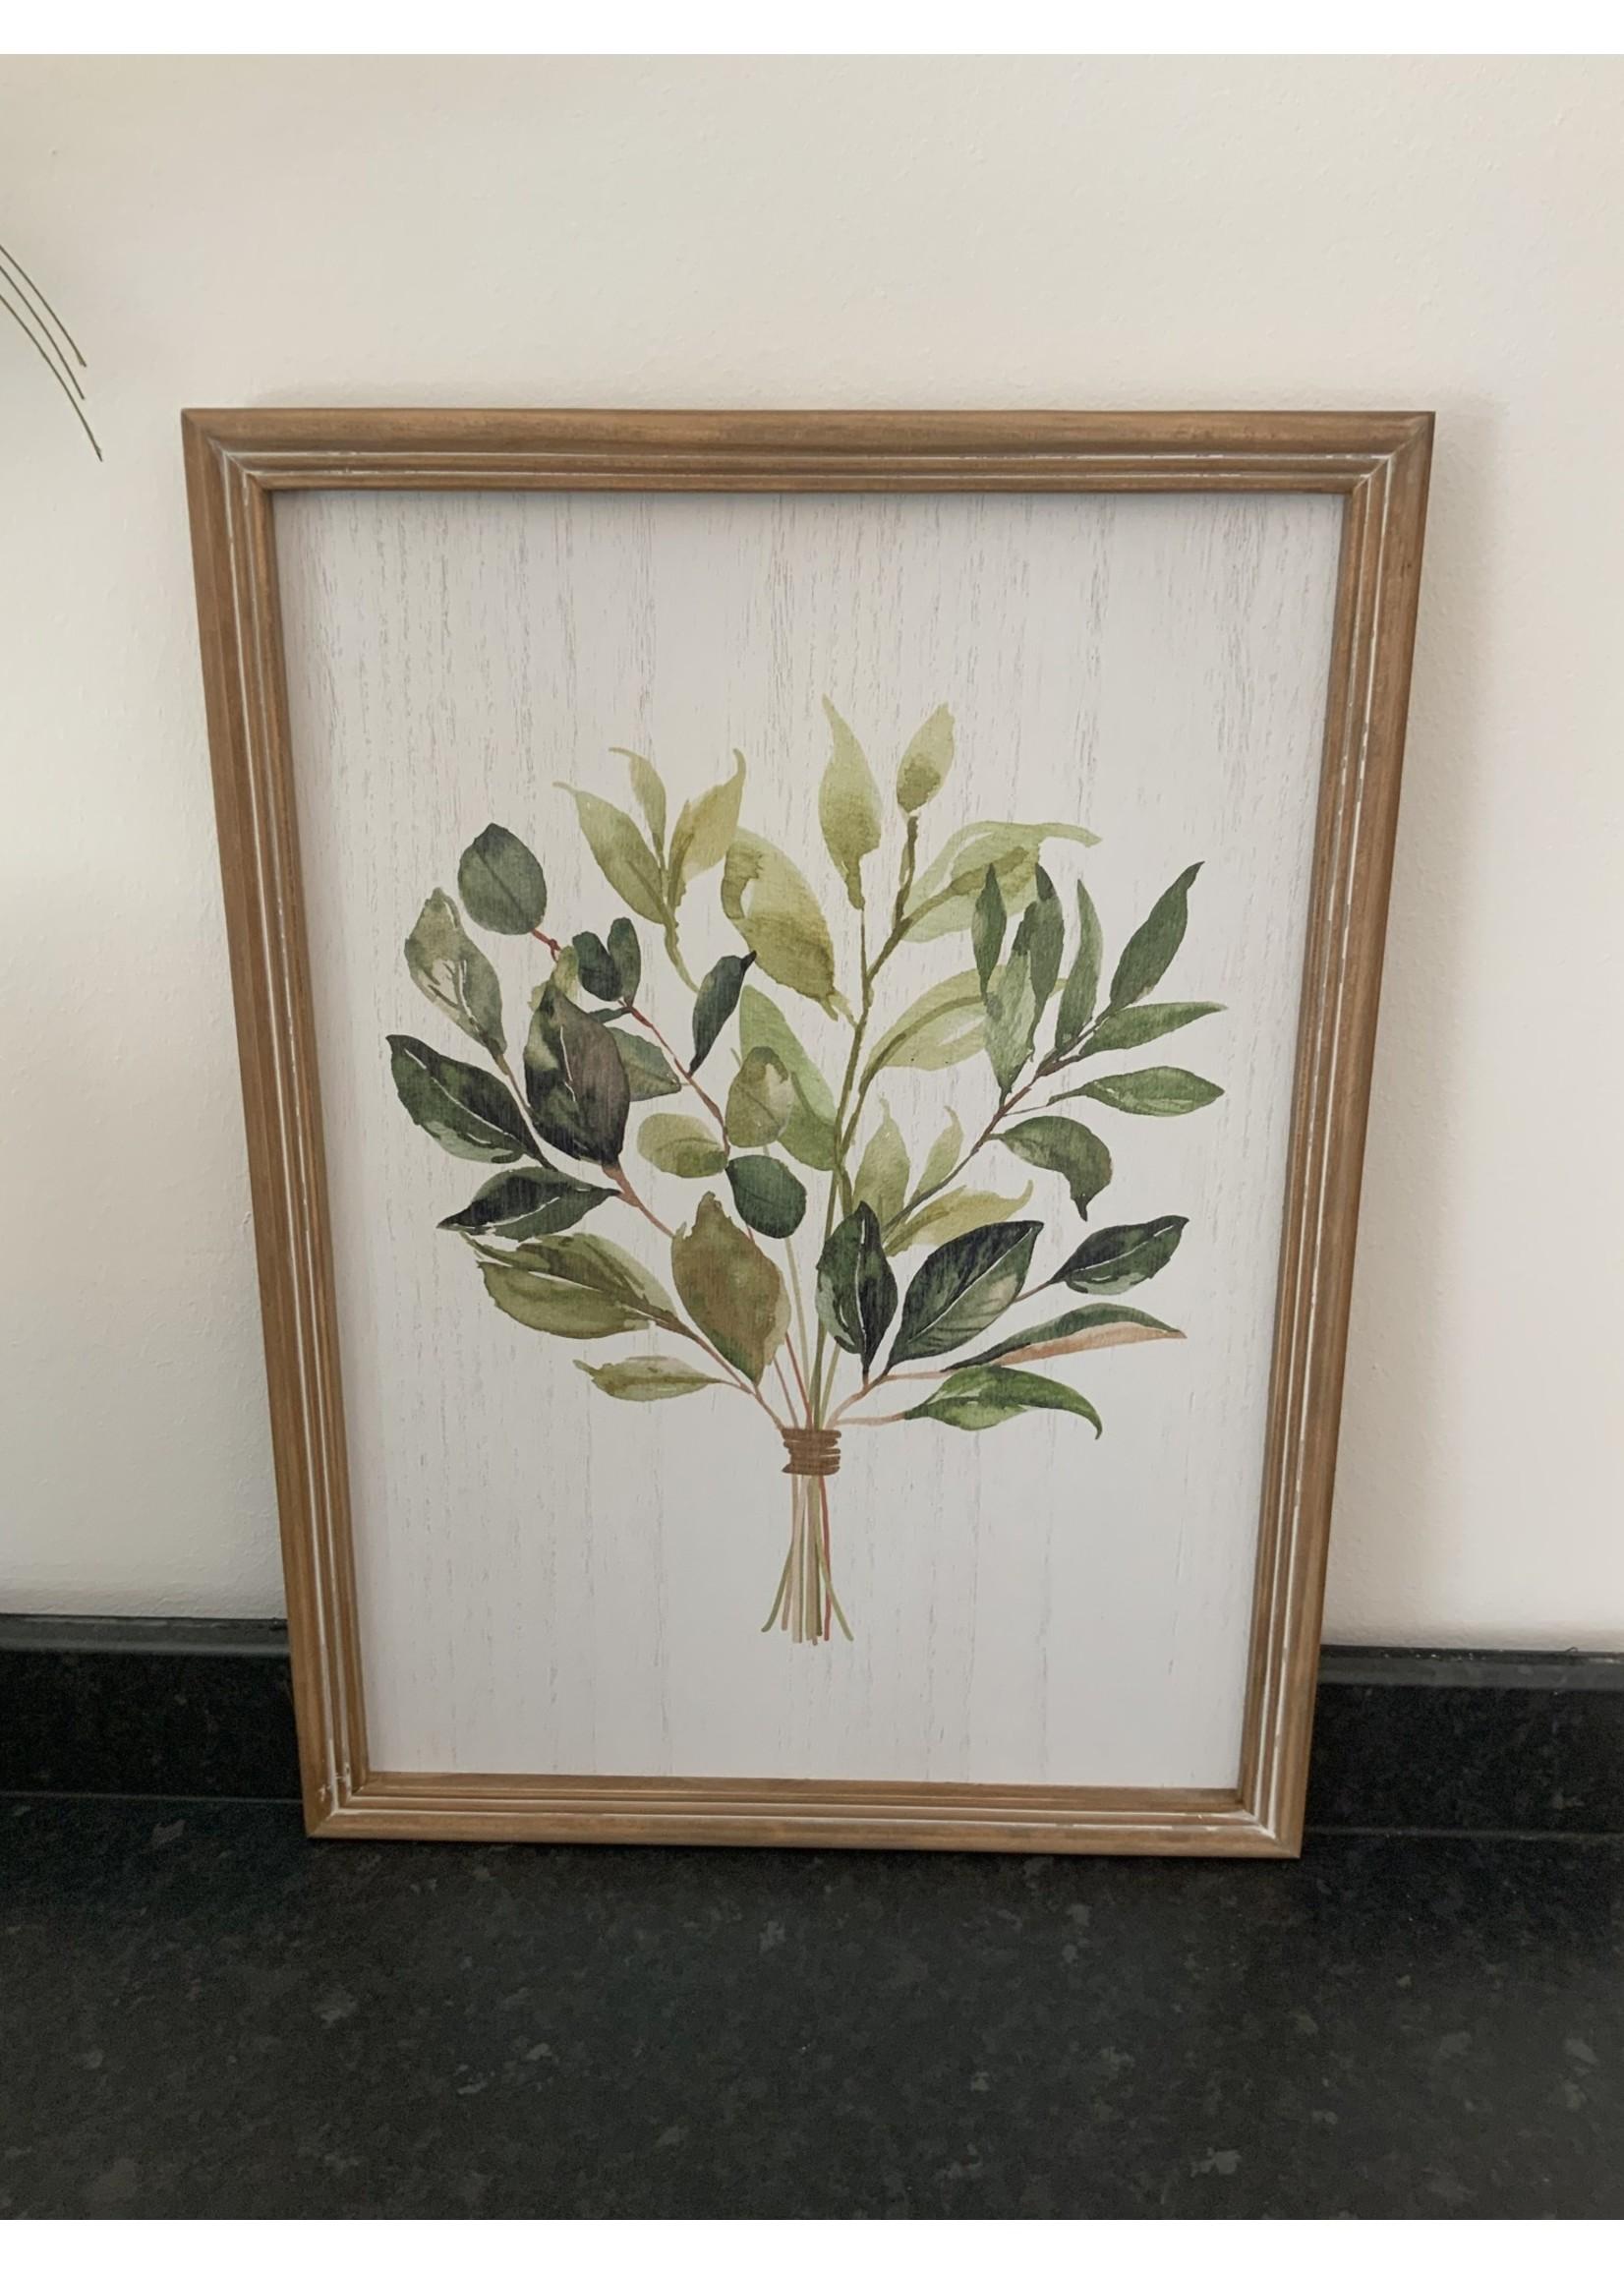 Foliage framed wall art